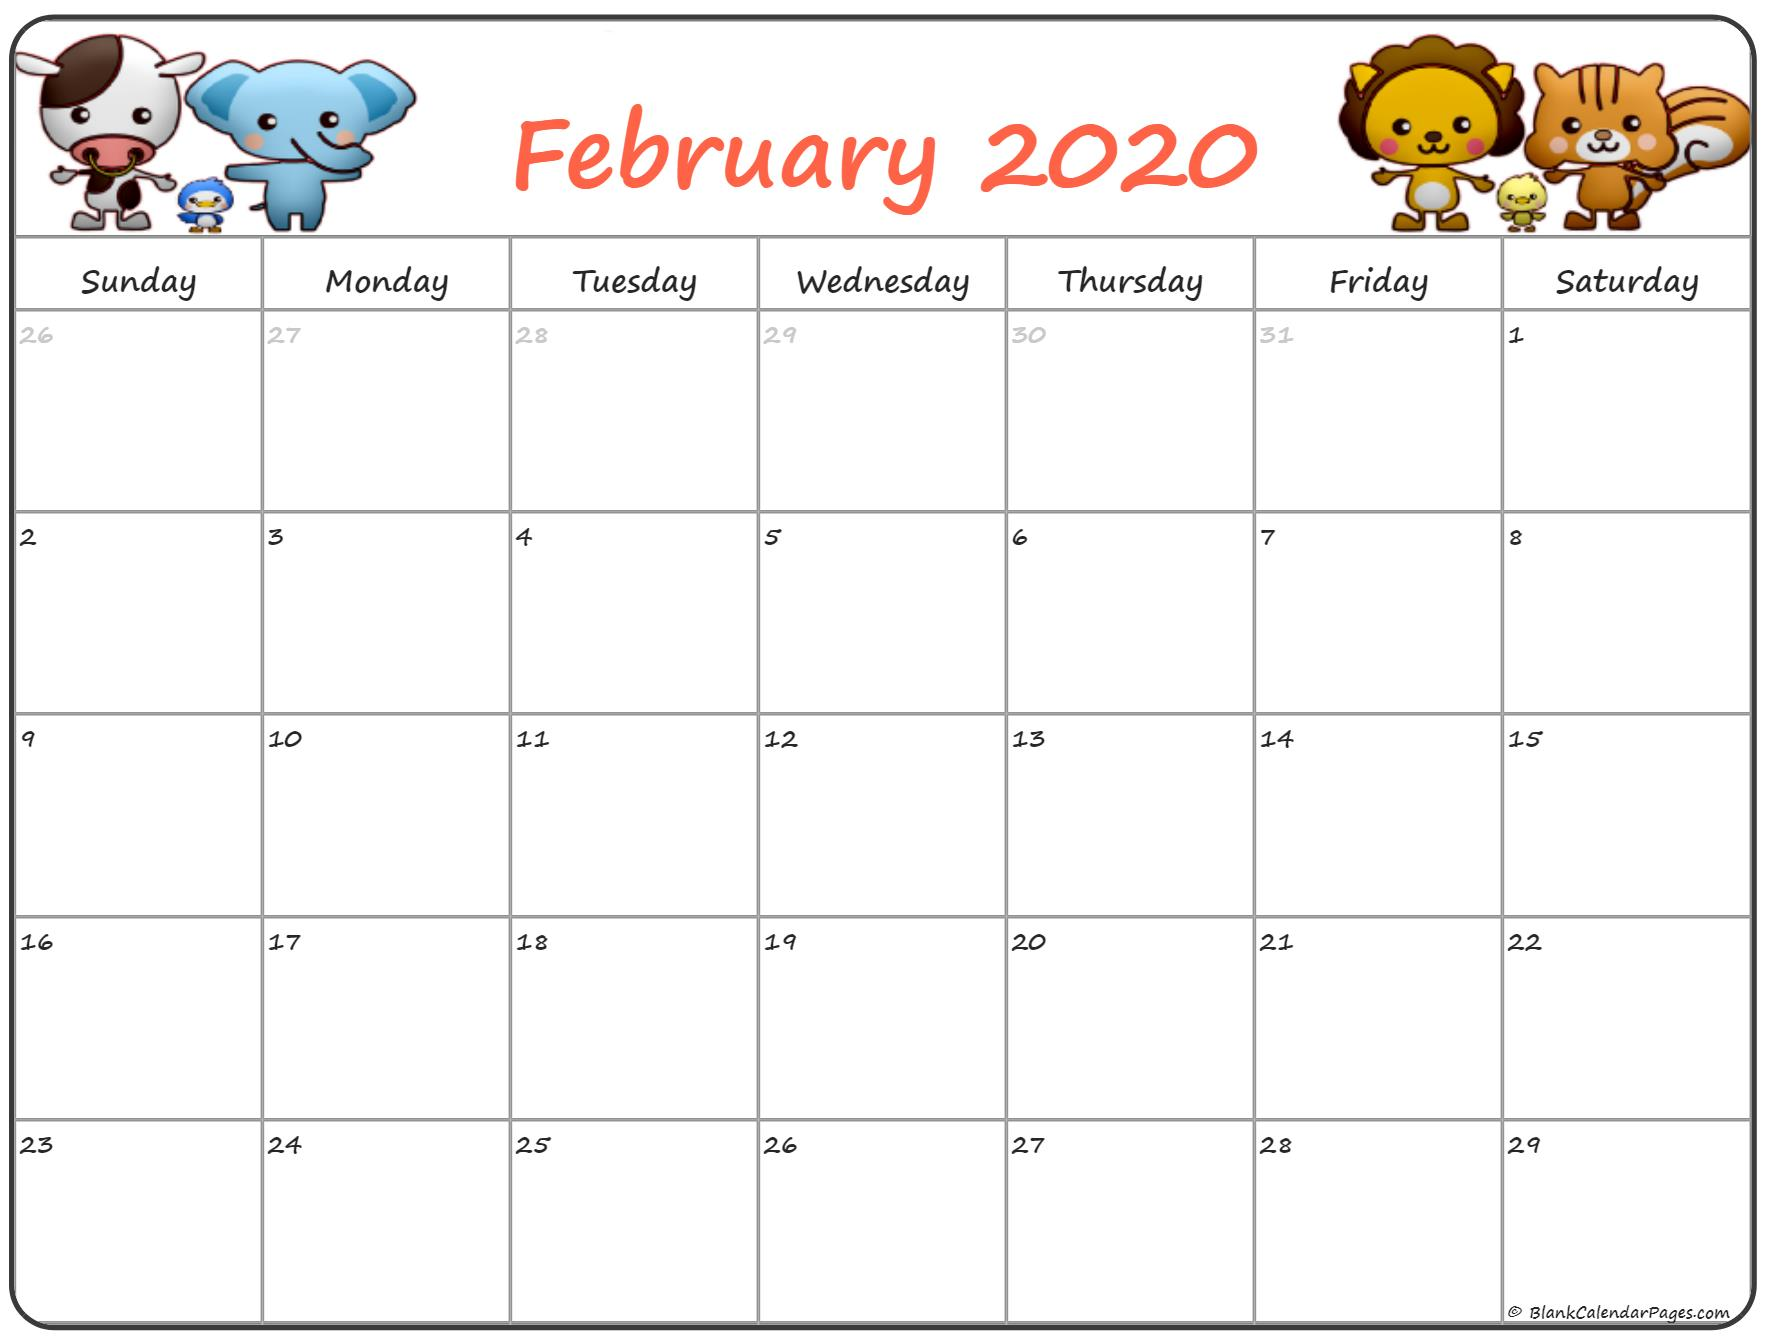 February 2020 Cute Calendar Floral